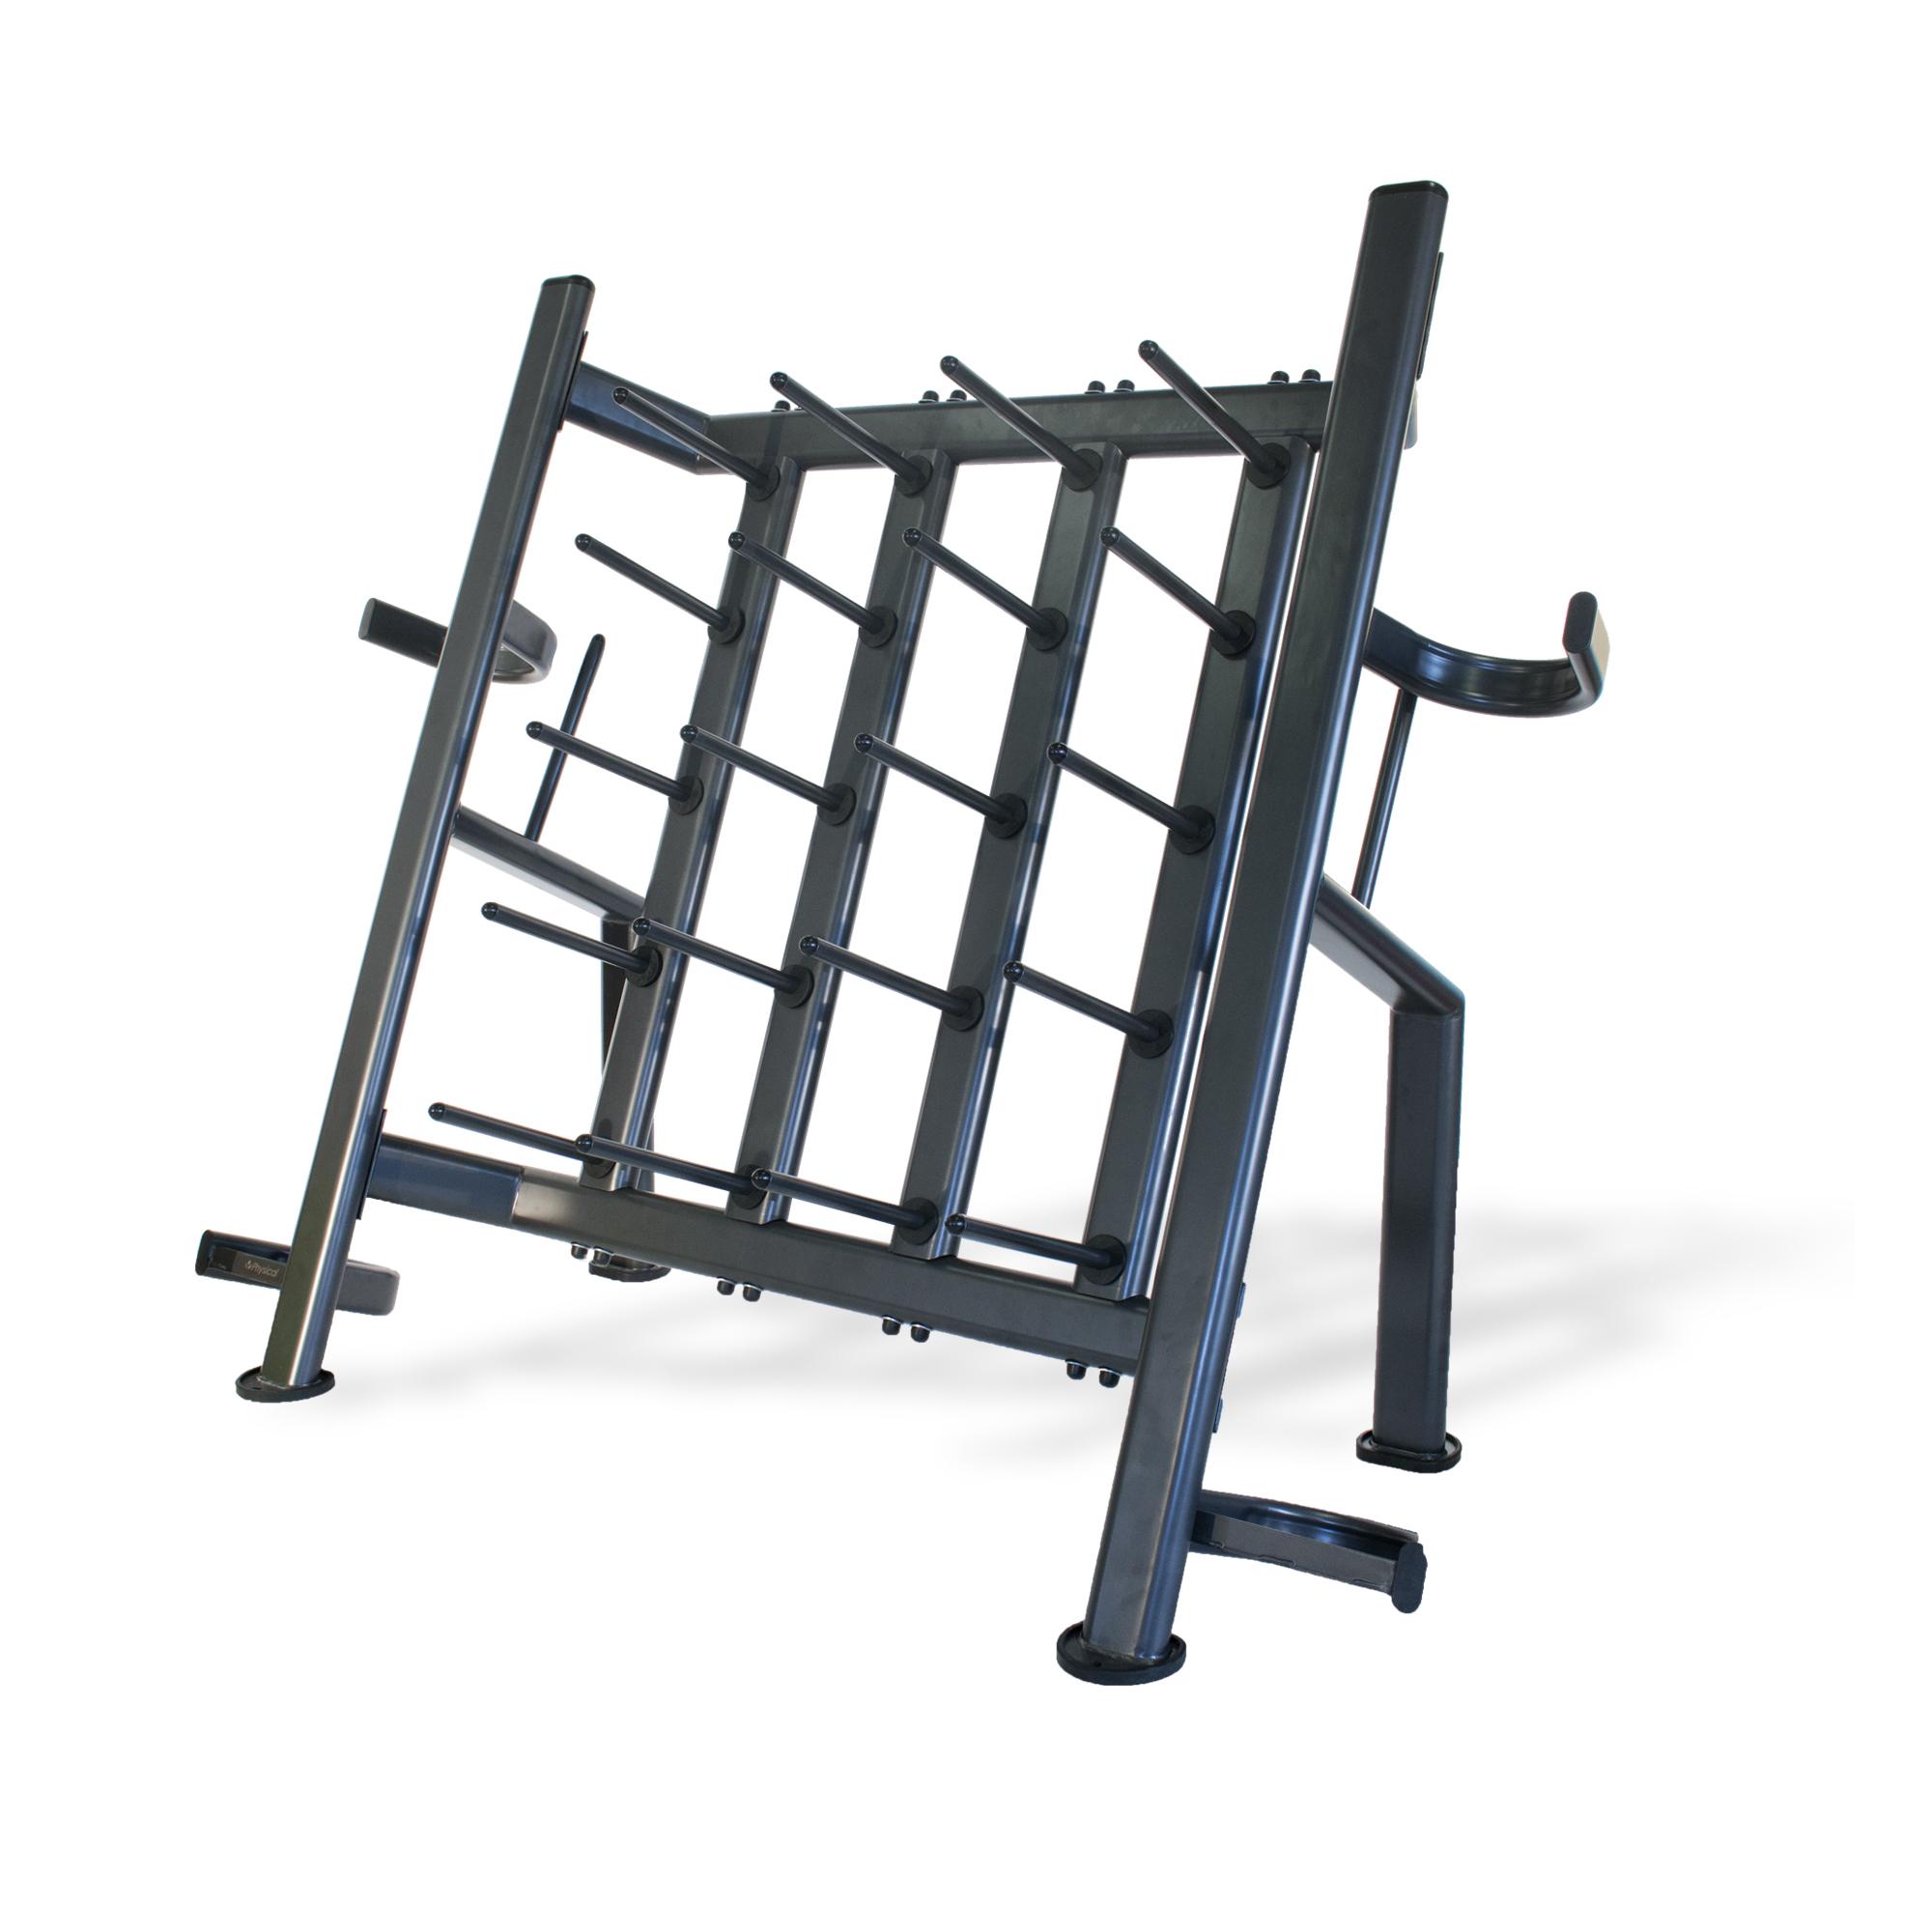 30 Set Body Pump Set Rack Empty Physical Company Ltd